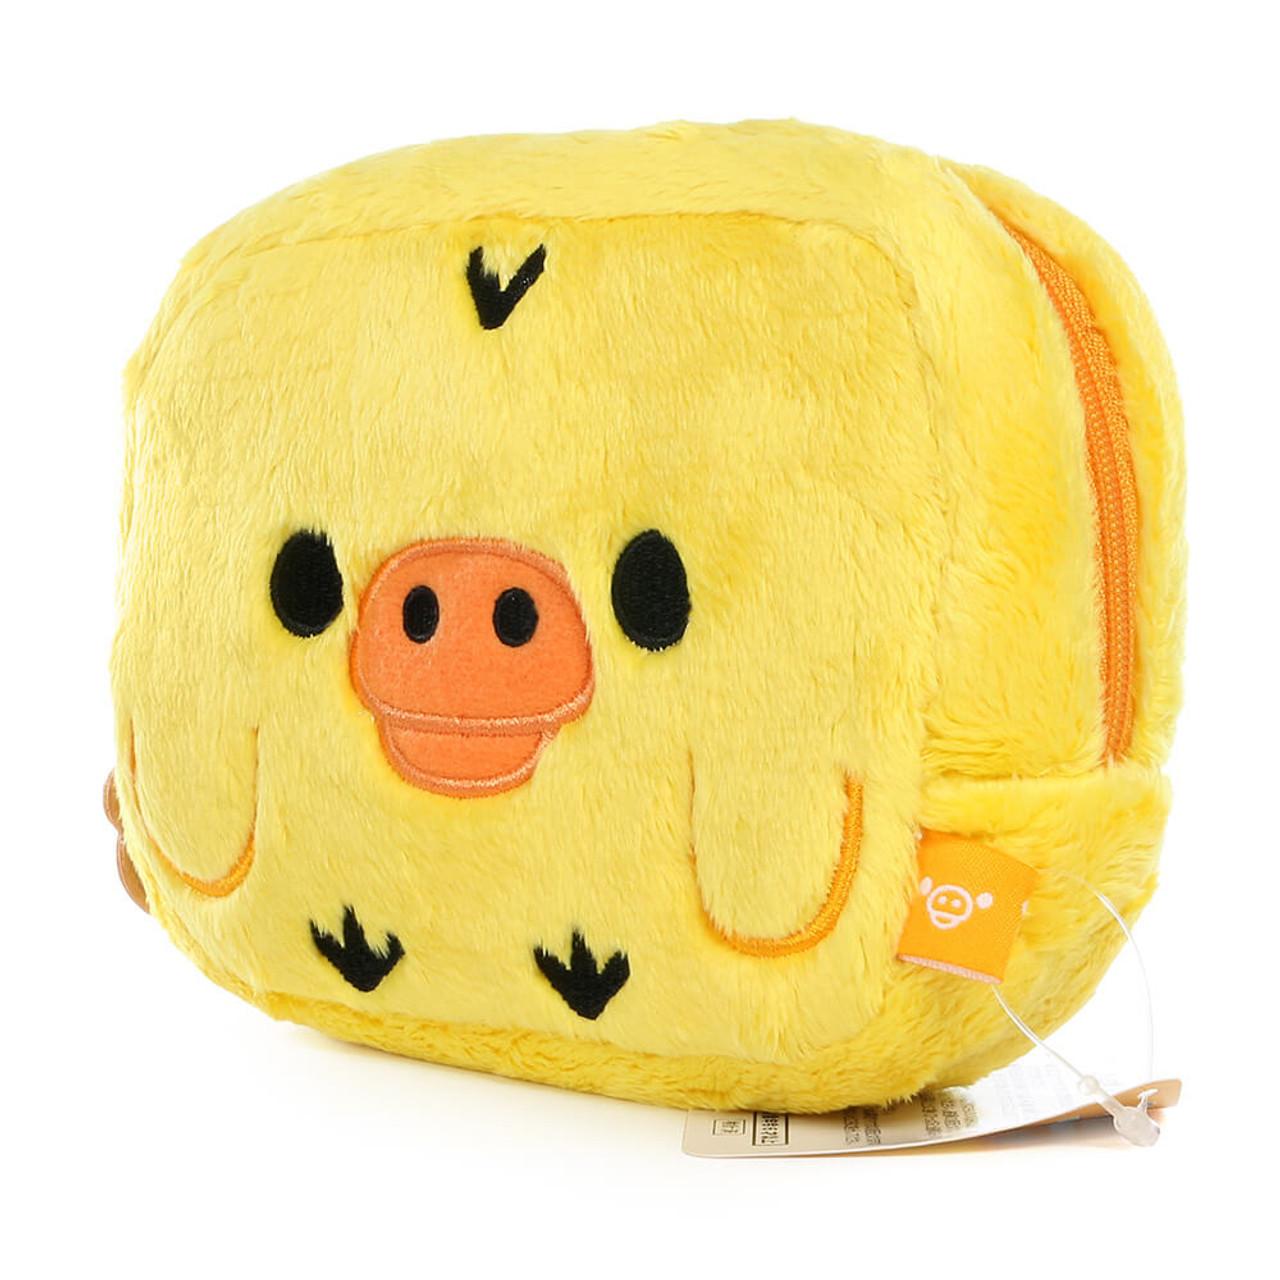 San-x Kiiroitori Yellow Chick Rectangle Face Plush Cosmetic Pouch ( Side View )